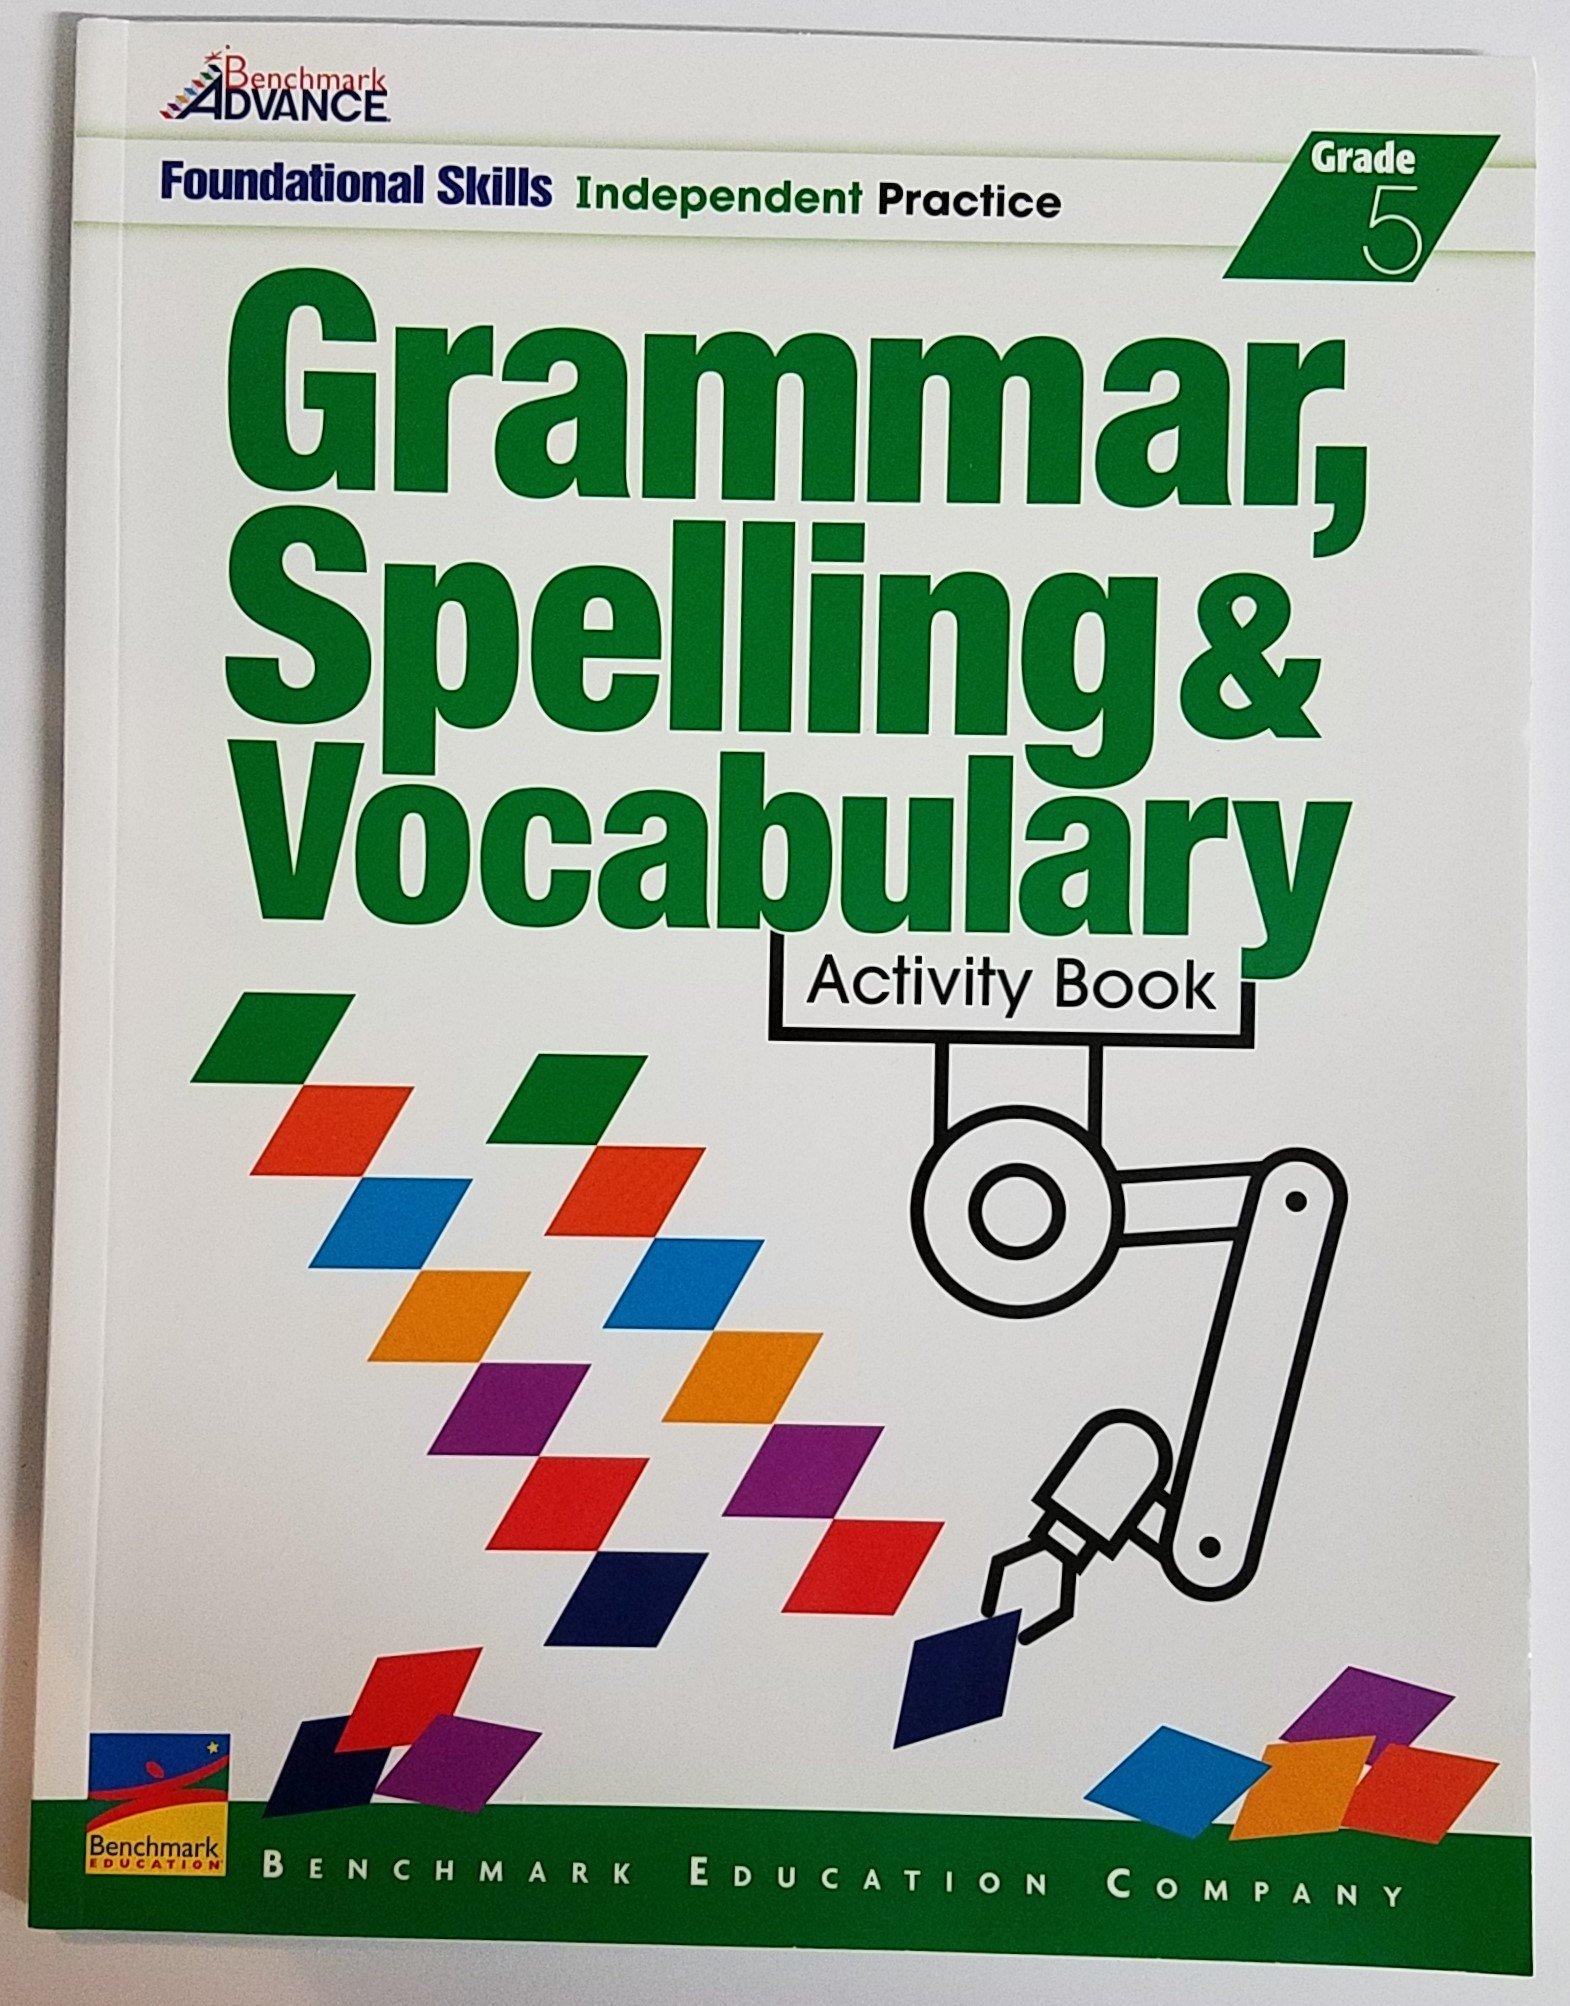 Download Benchmark Advance - Grammar, Spelling & Vocabulary - Activity Book - Grade 5 ebook